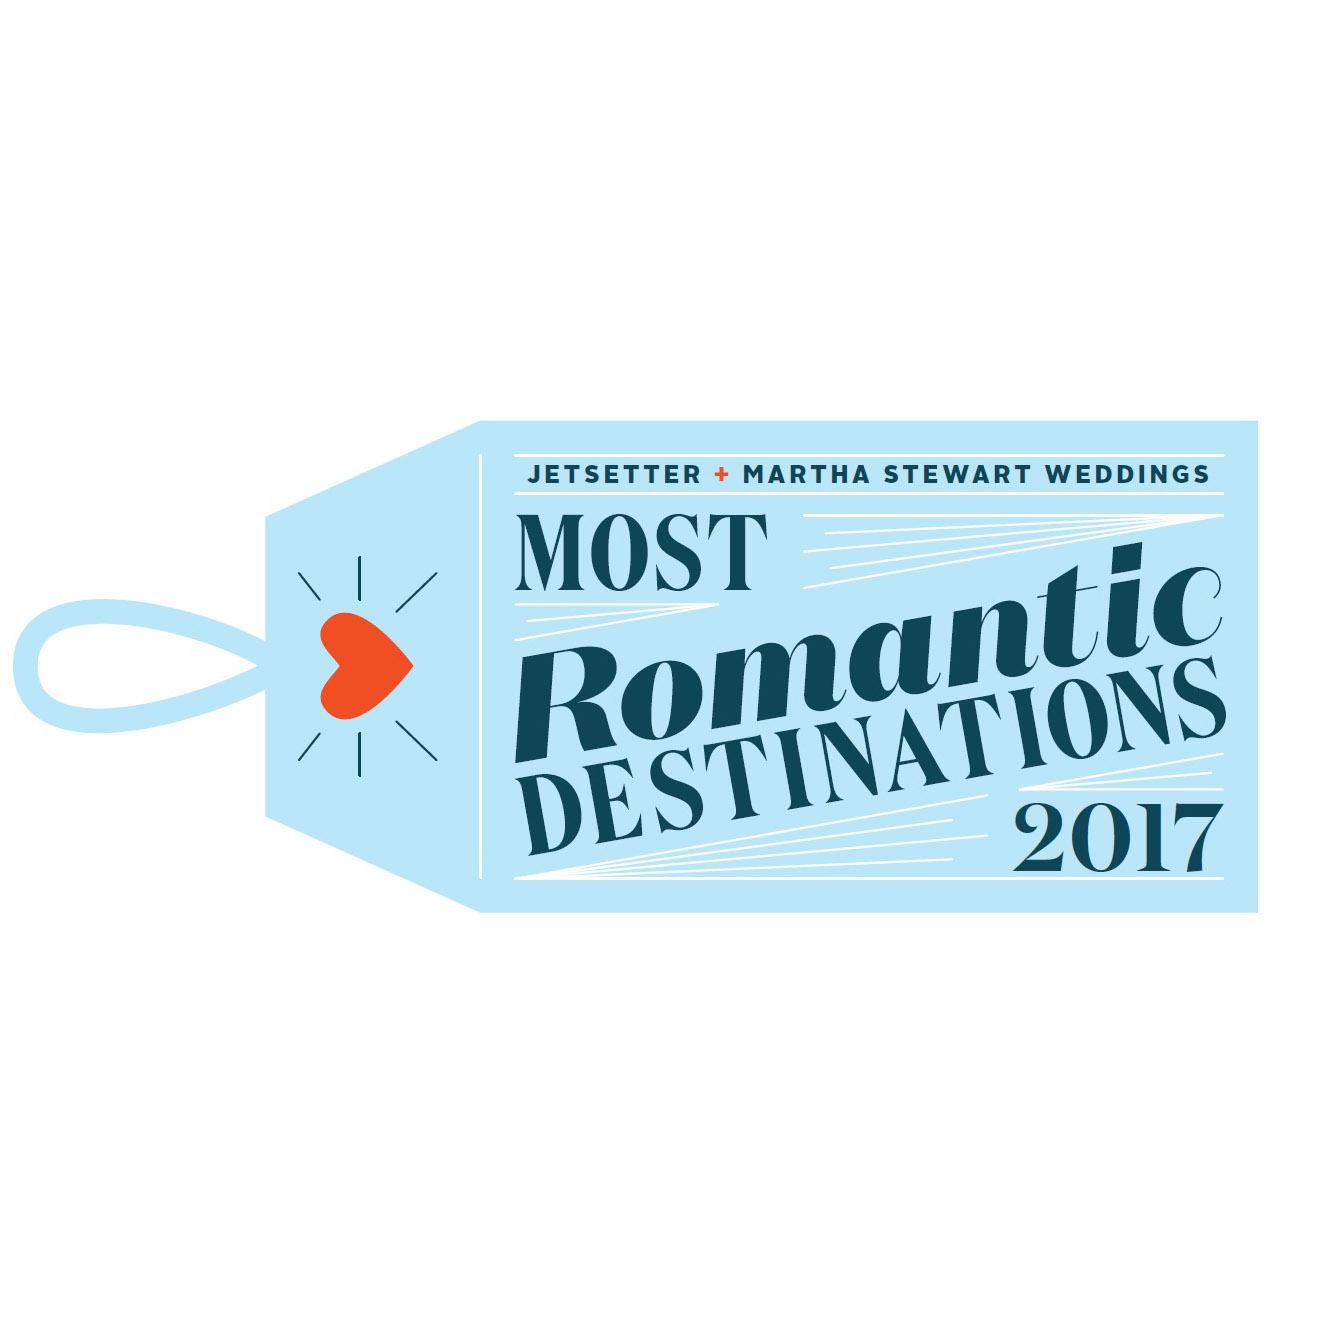 Martha Stewart Weddings and Jetsetter Most Romantic Destinations Survey